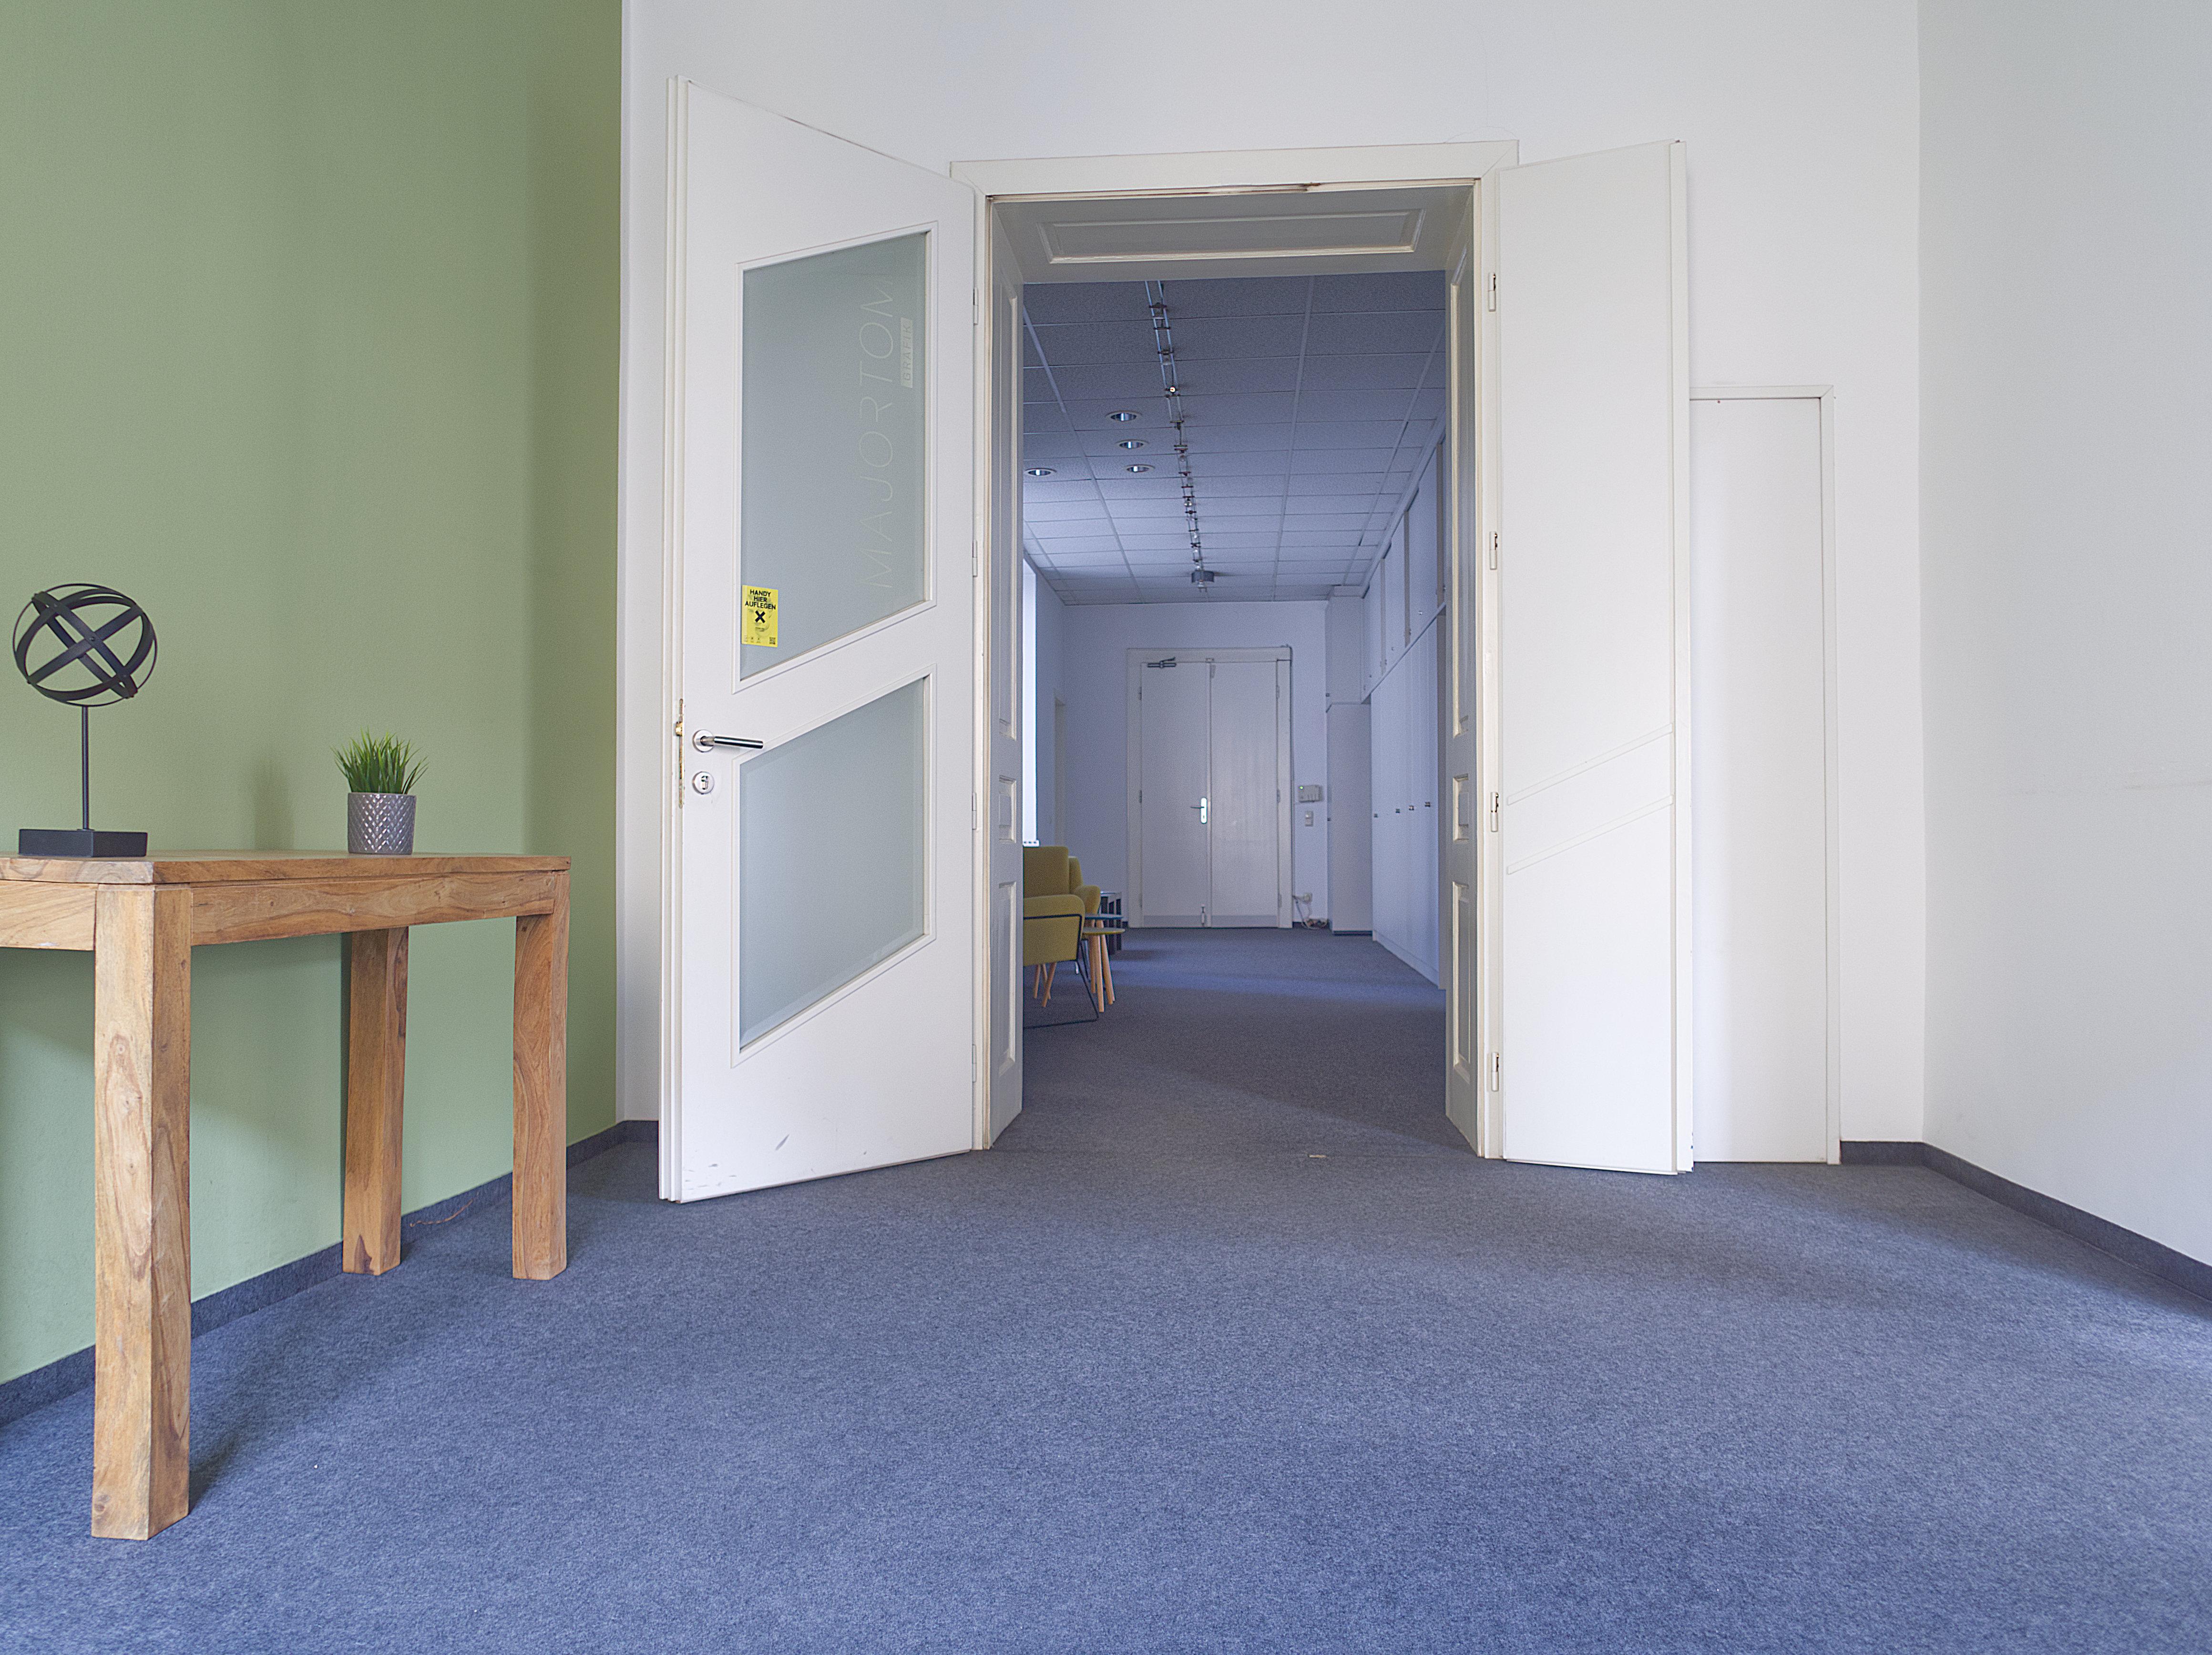 1. Raum